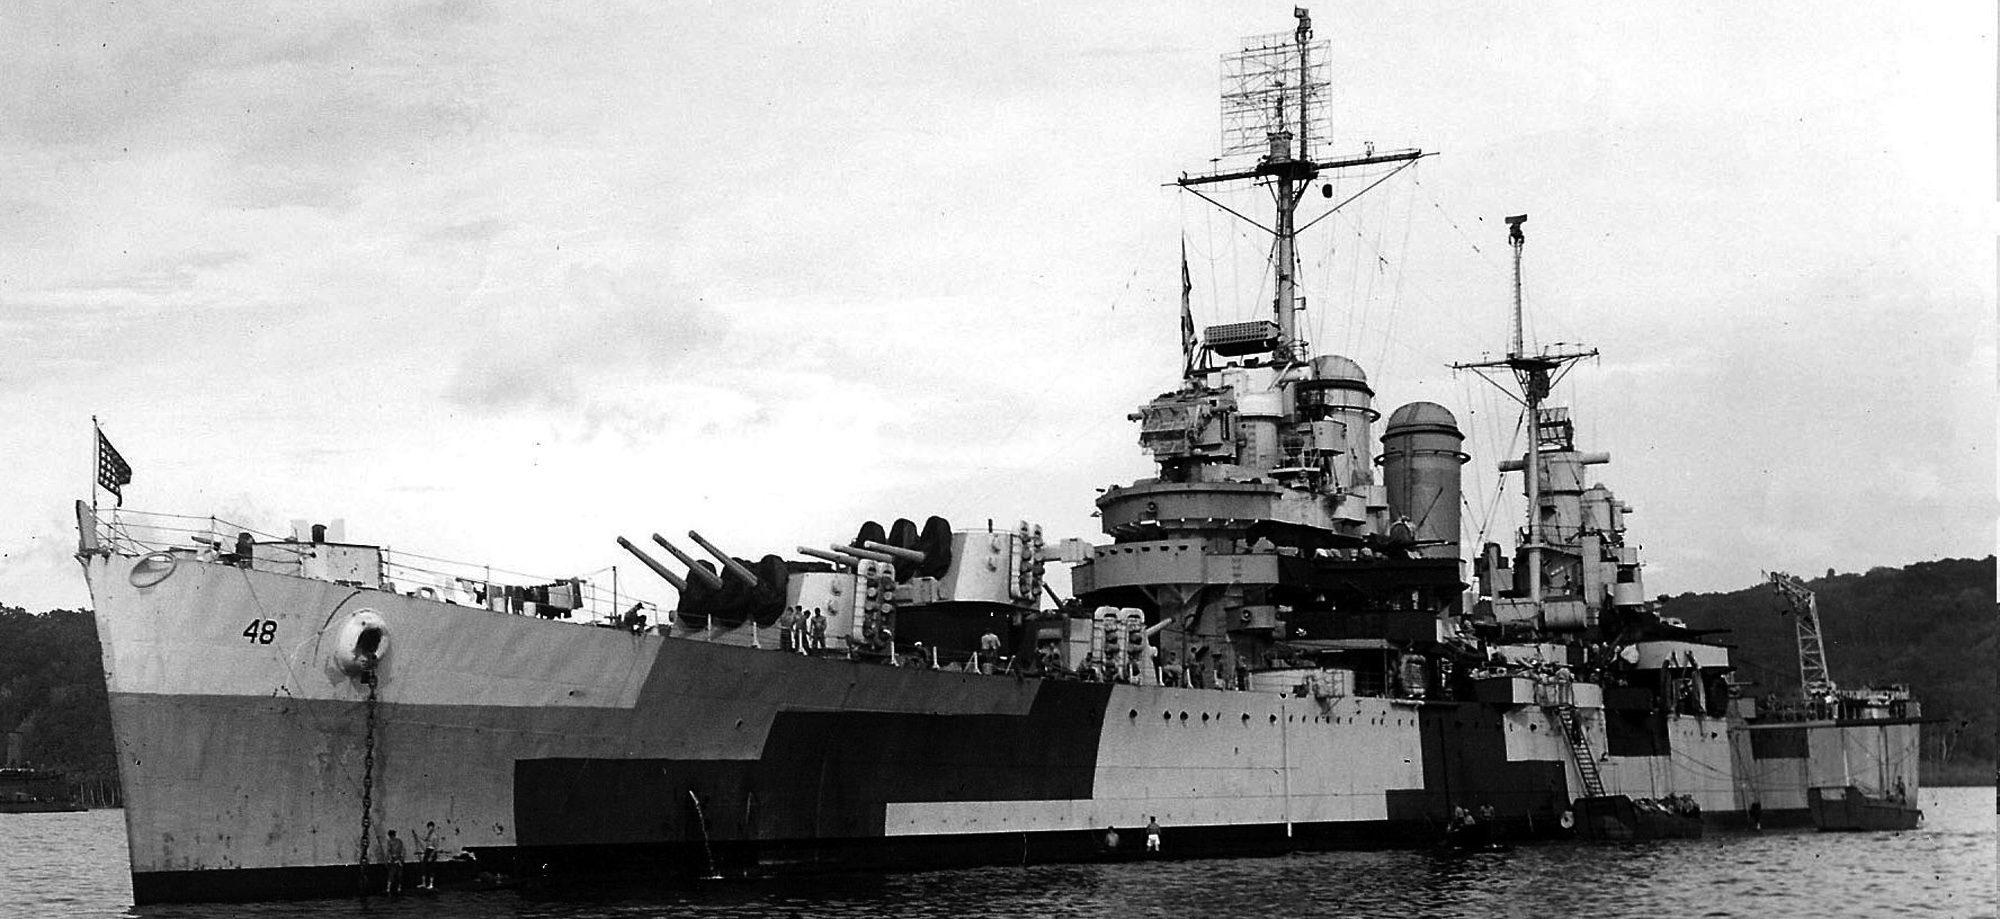 poster - USSHonolulu- Brooklyn class